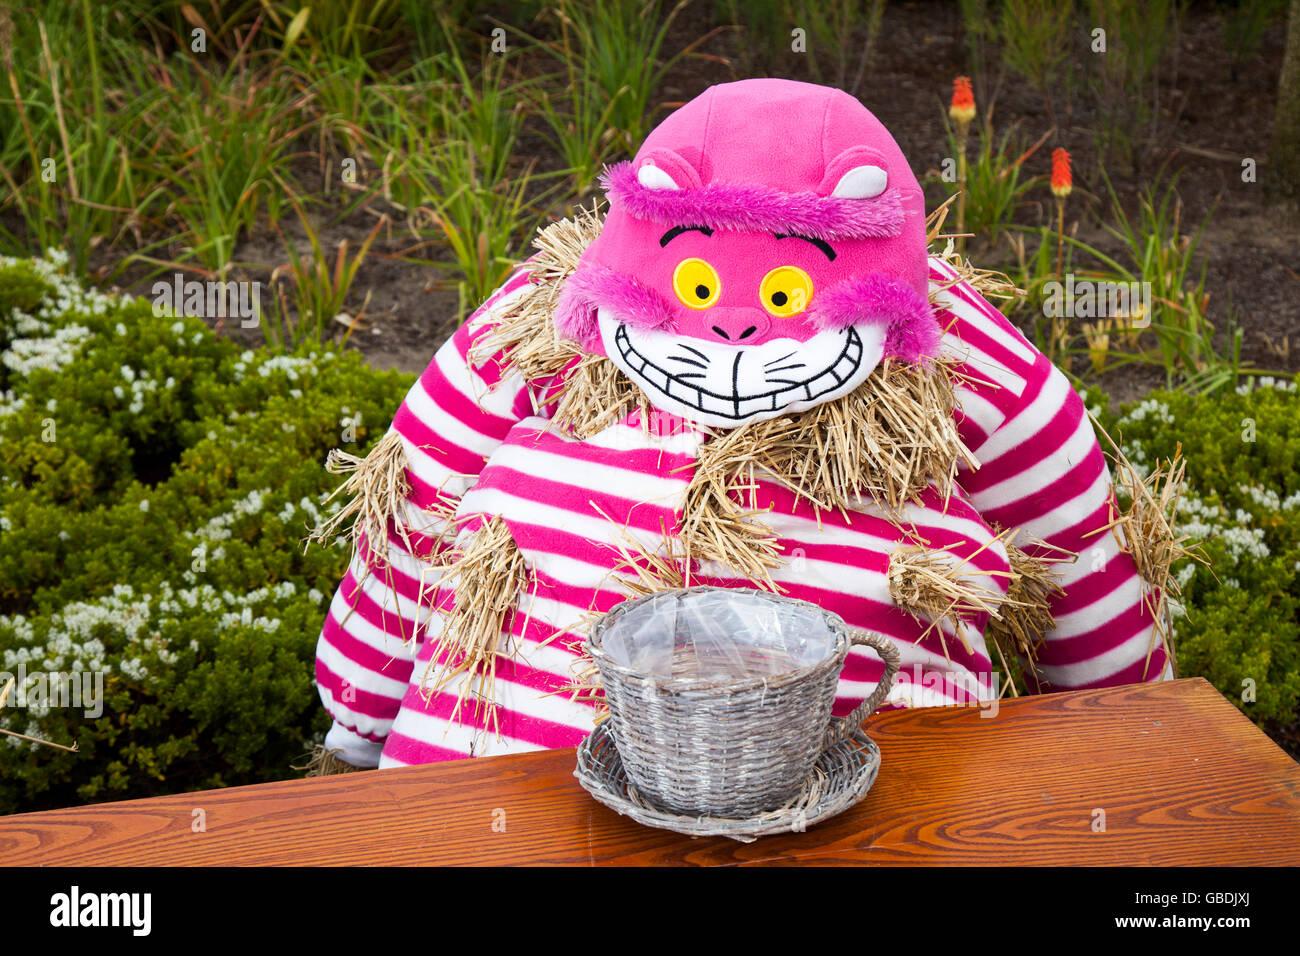 Cheshire Cat Imágenes De Stock & Cheshire Cat Fotos De Stock - Alamy